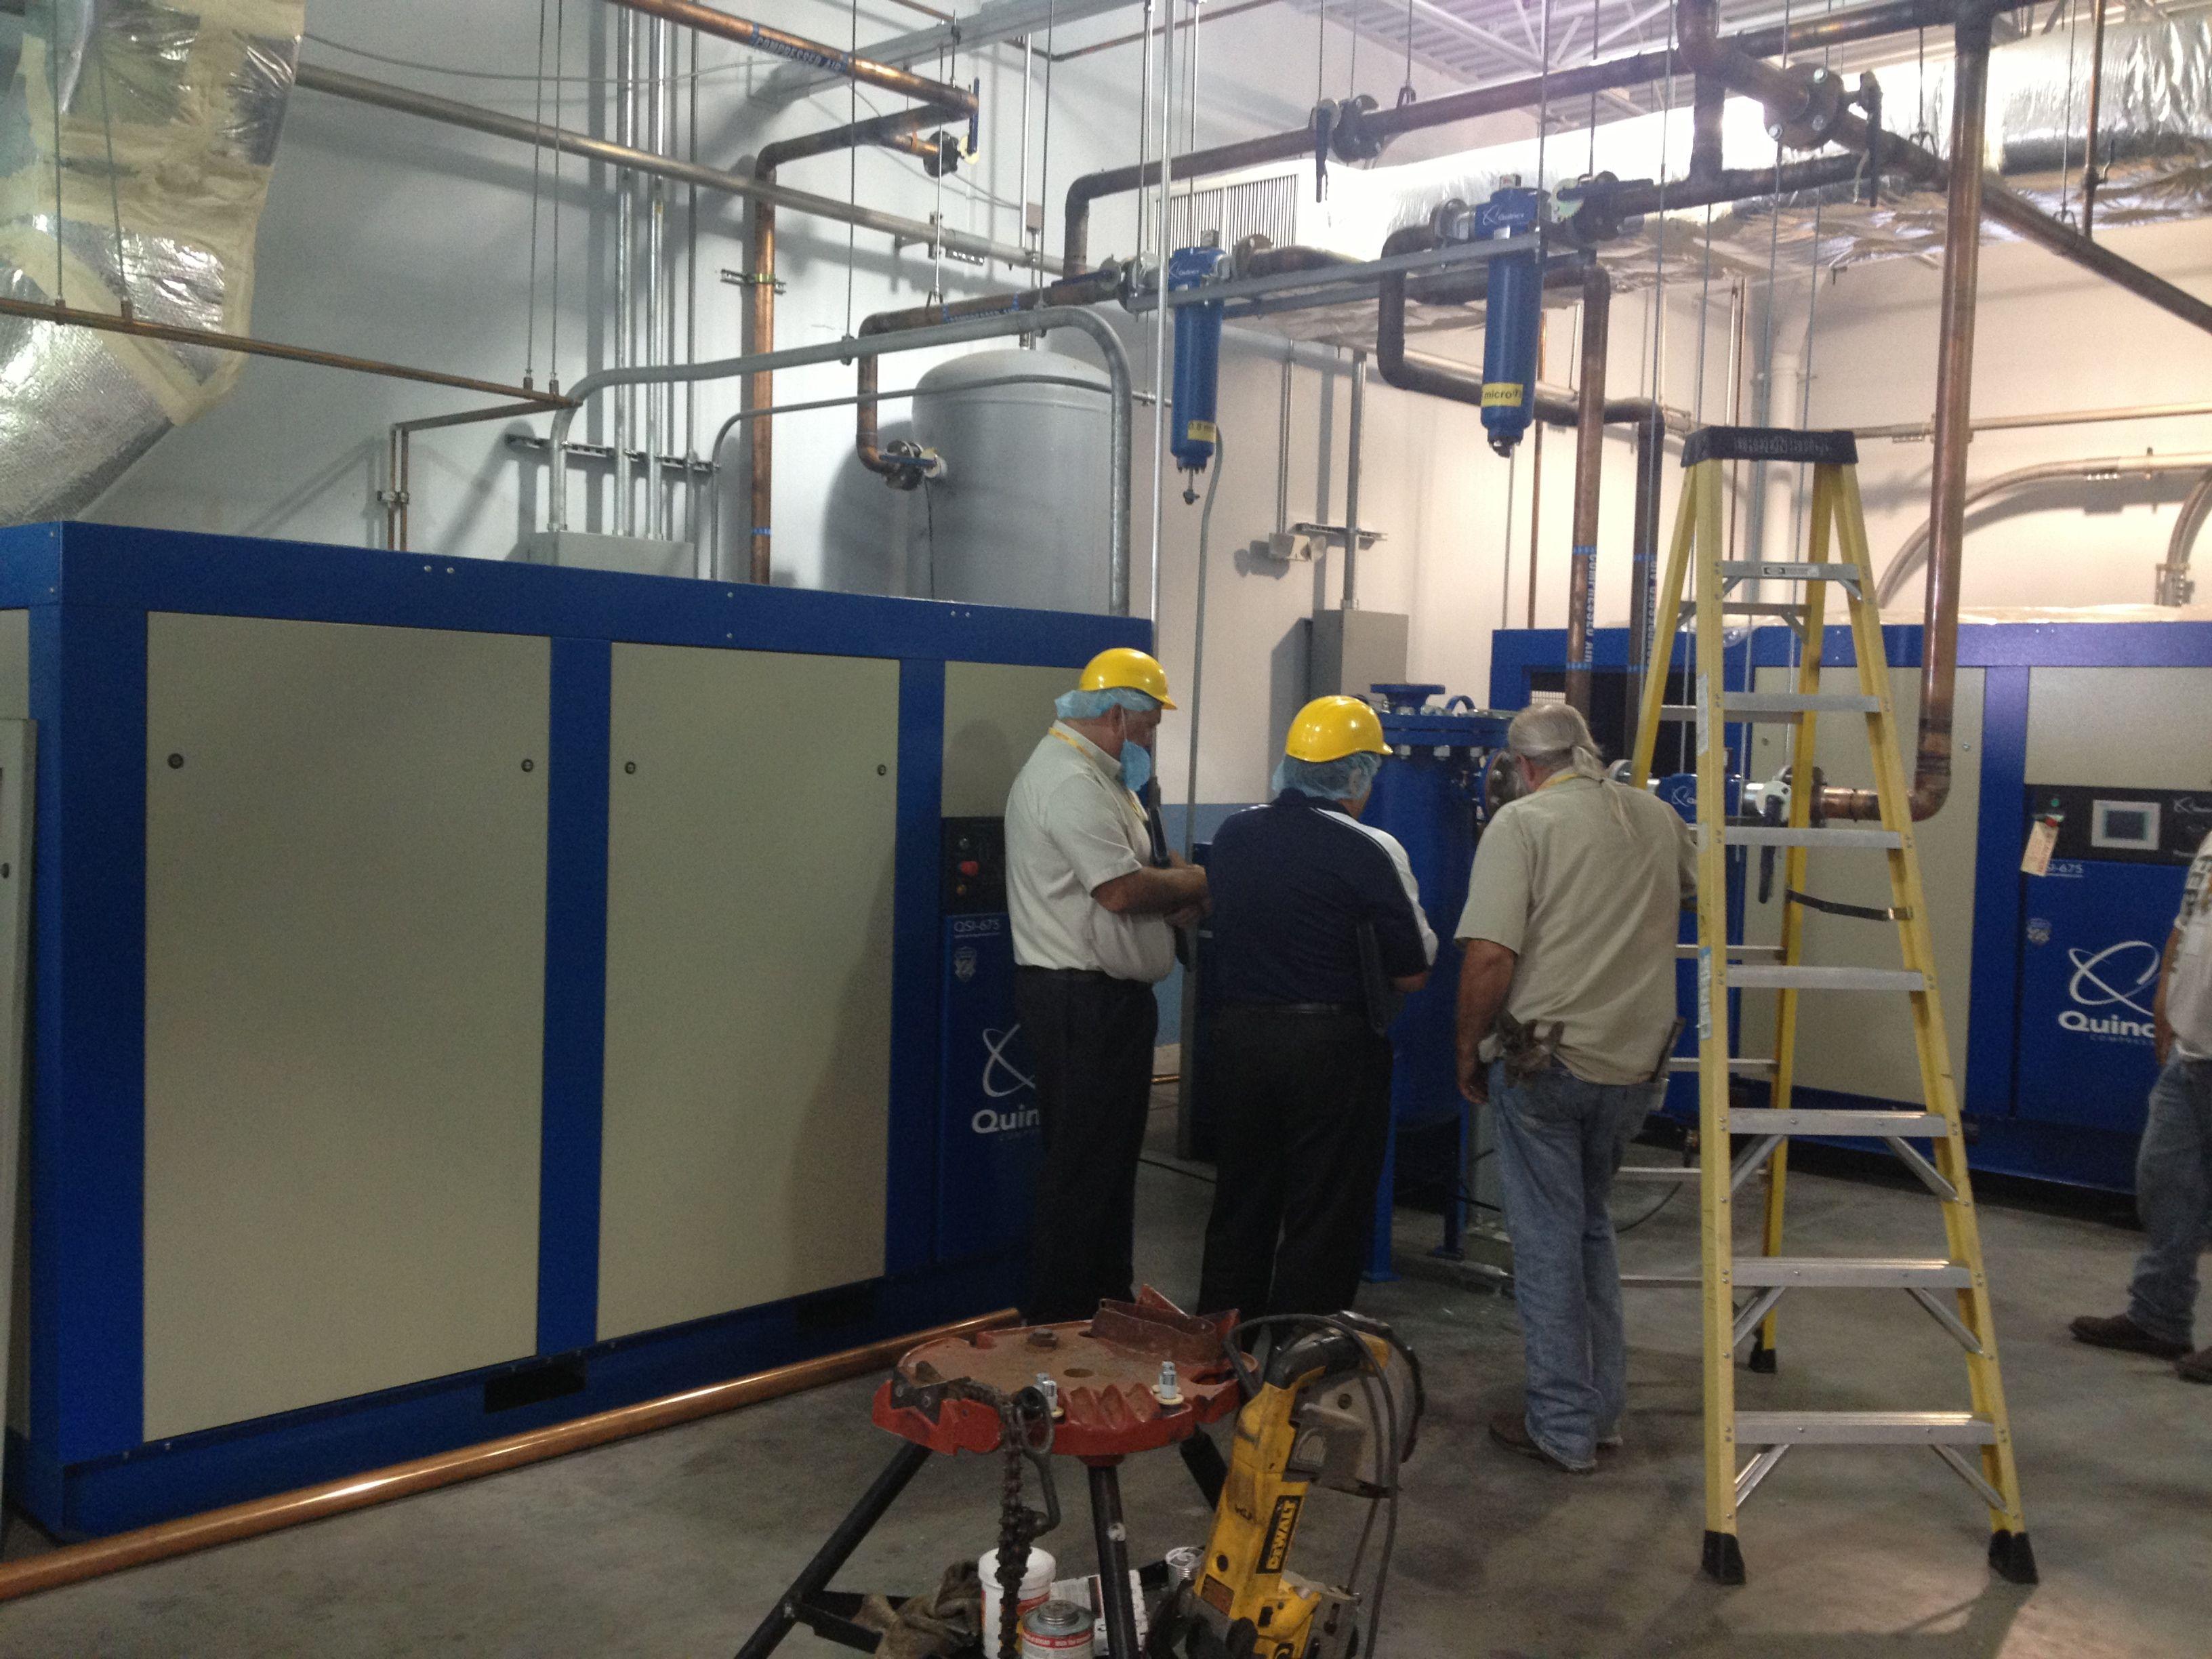 Quincy Compressor Direct installation photo Vacuum pump